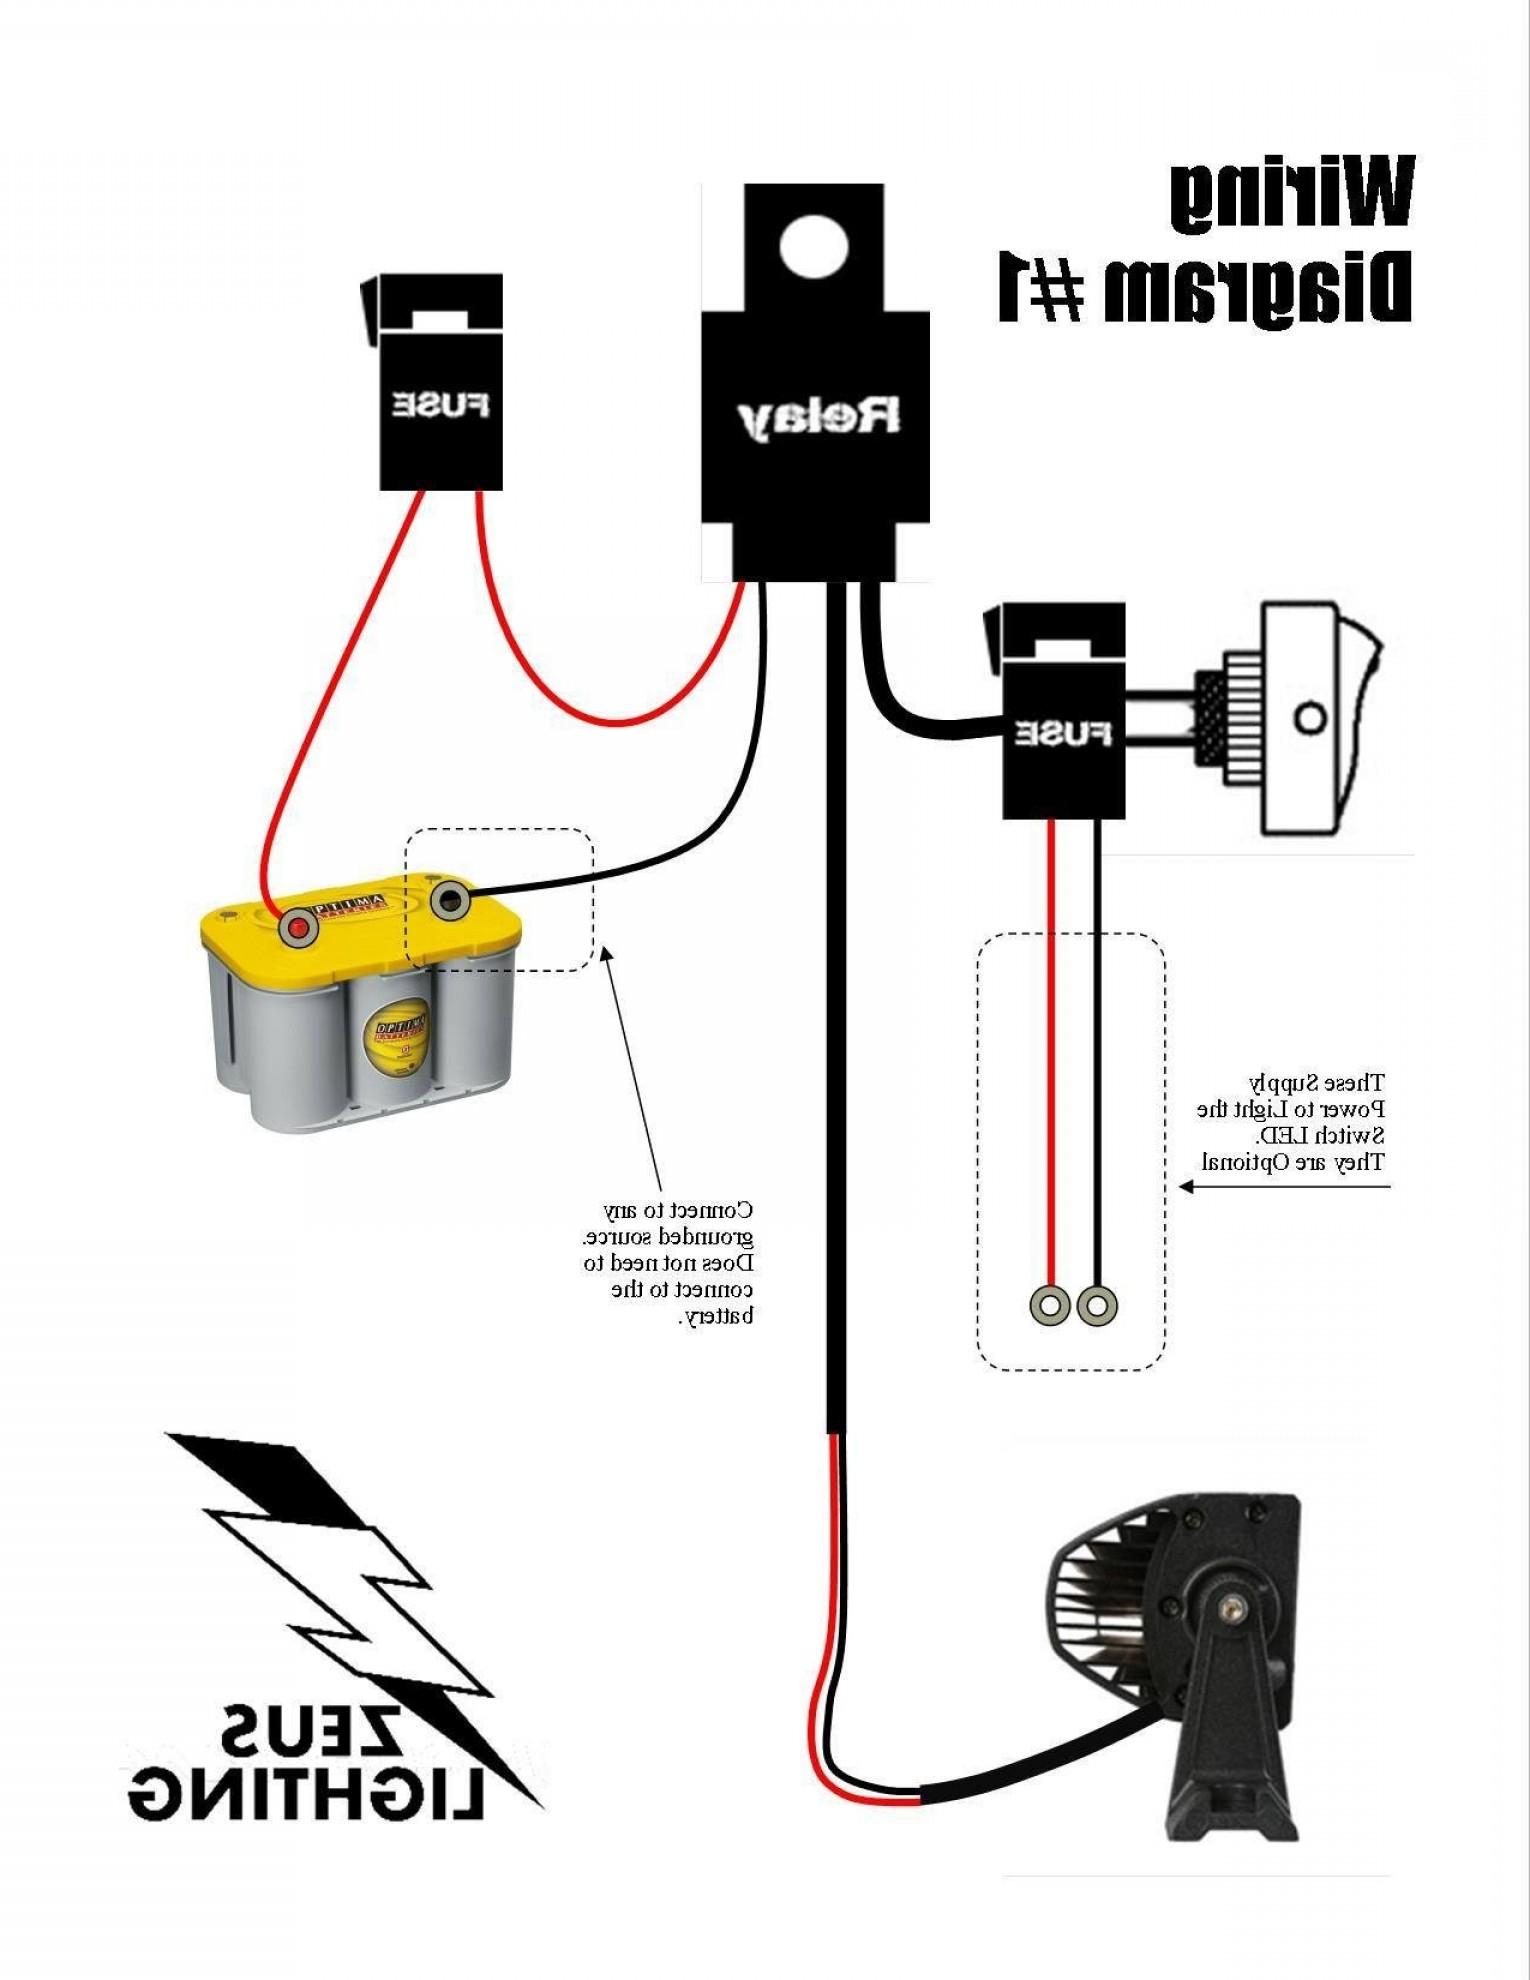 Wiring Diagram For Led Light Bar | Wiring Library - Autofeel Light Bar Wiring Diagram